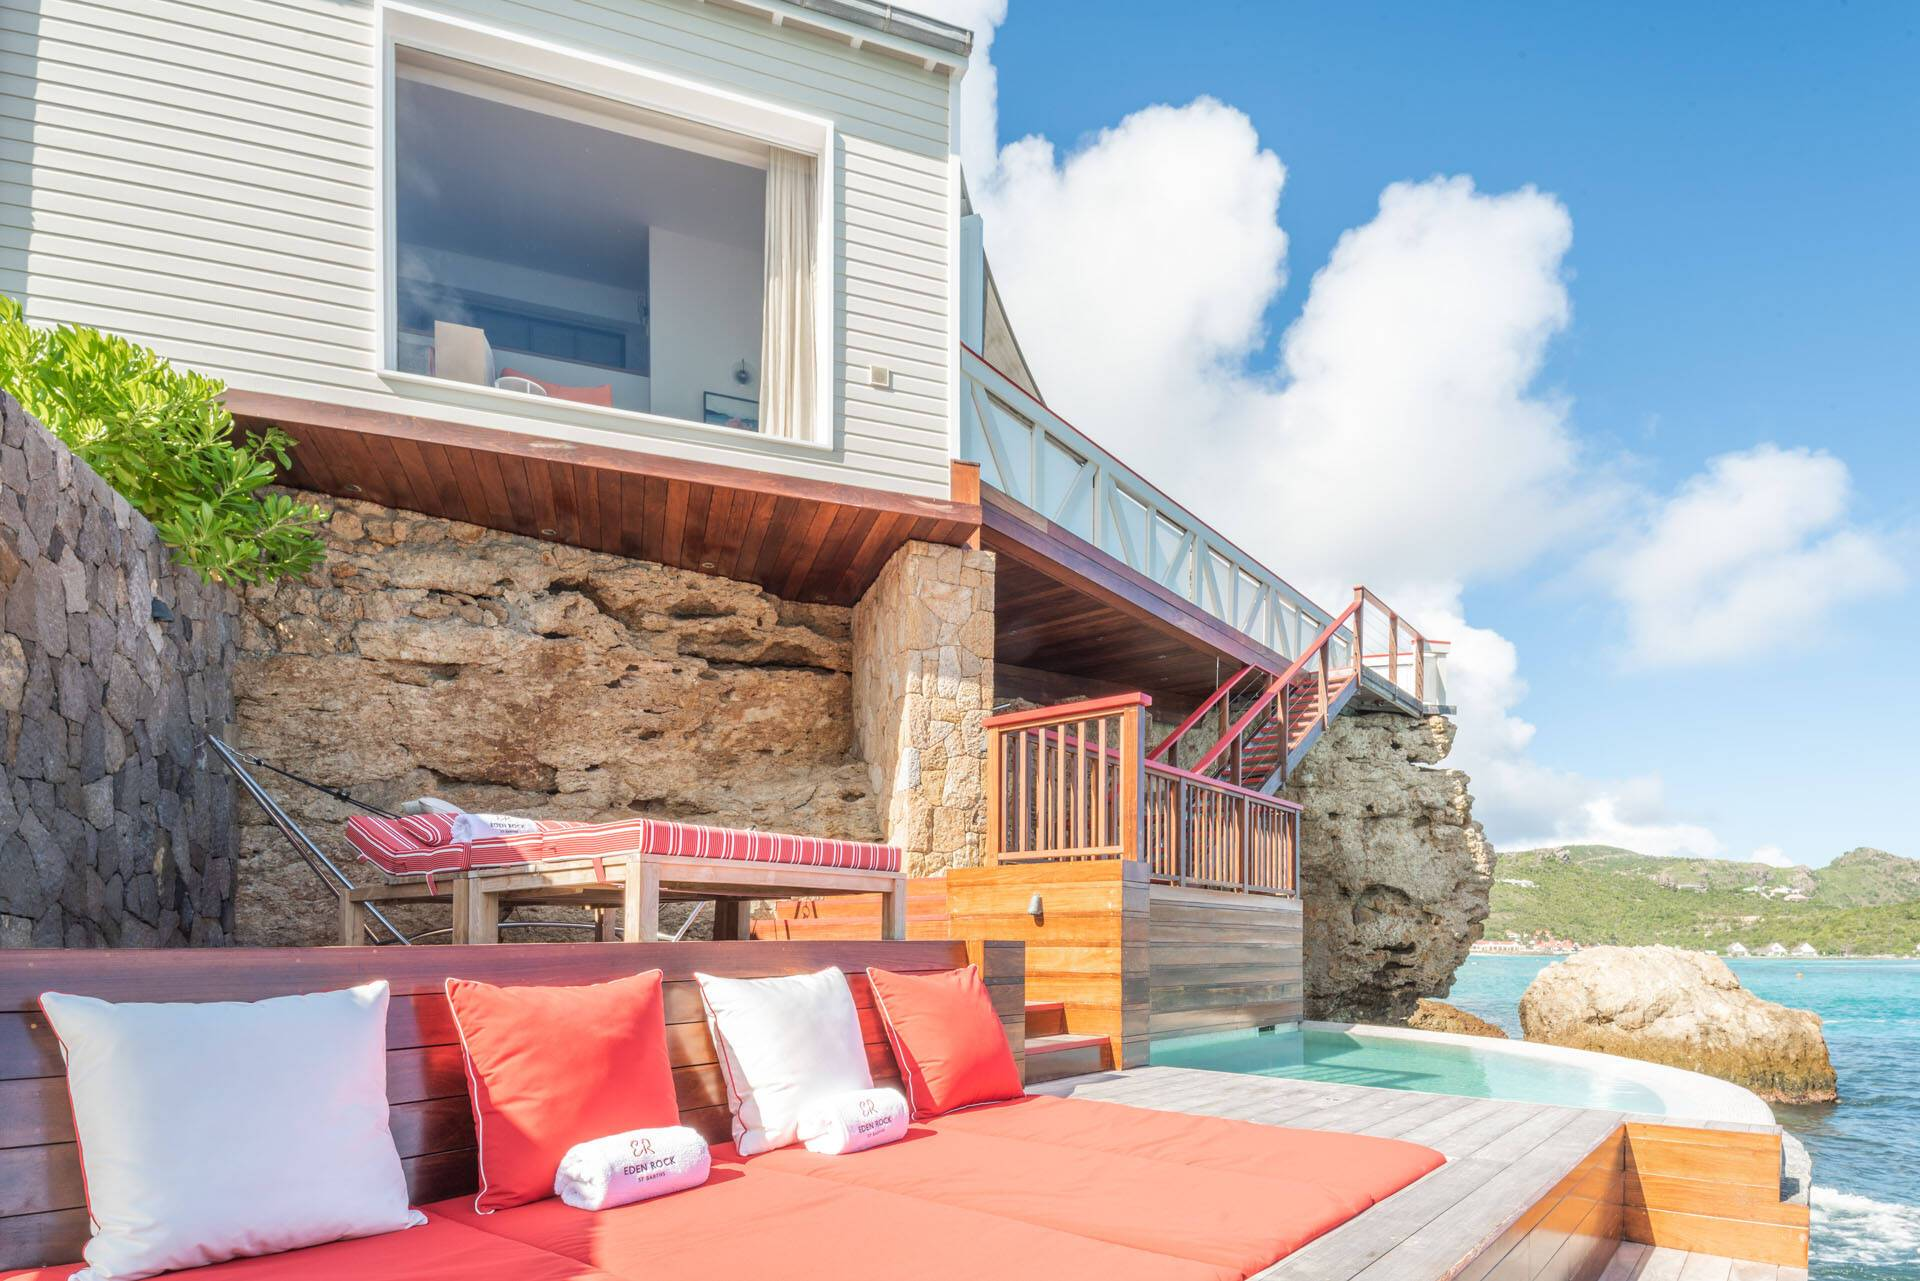 Eden Rock Saint Barth Fregate Premium Suite Terrace